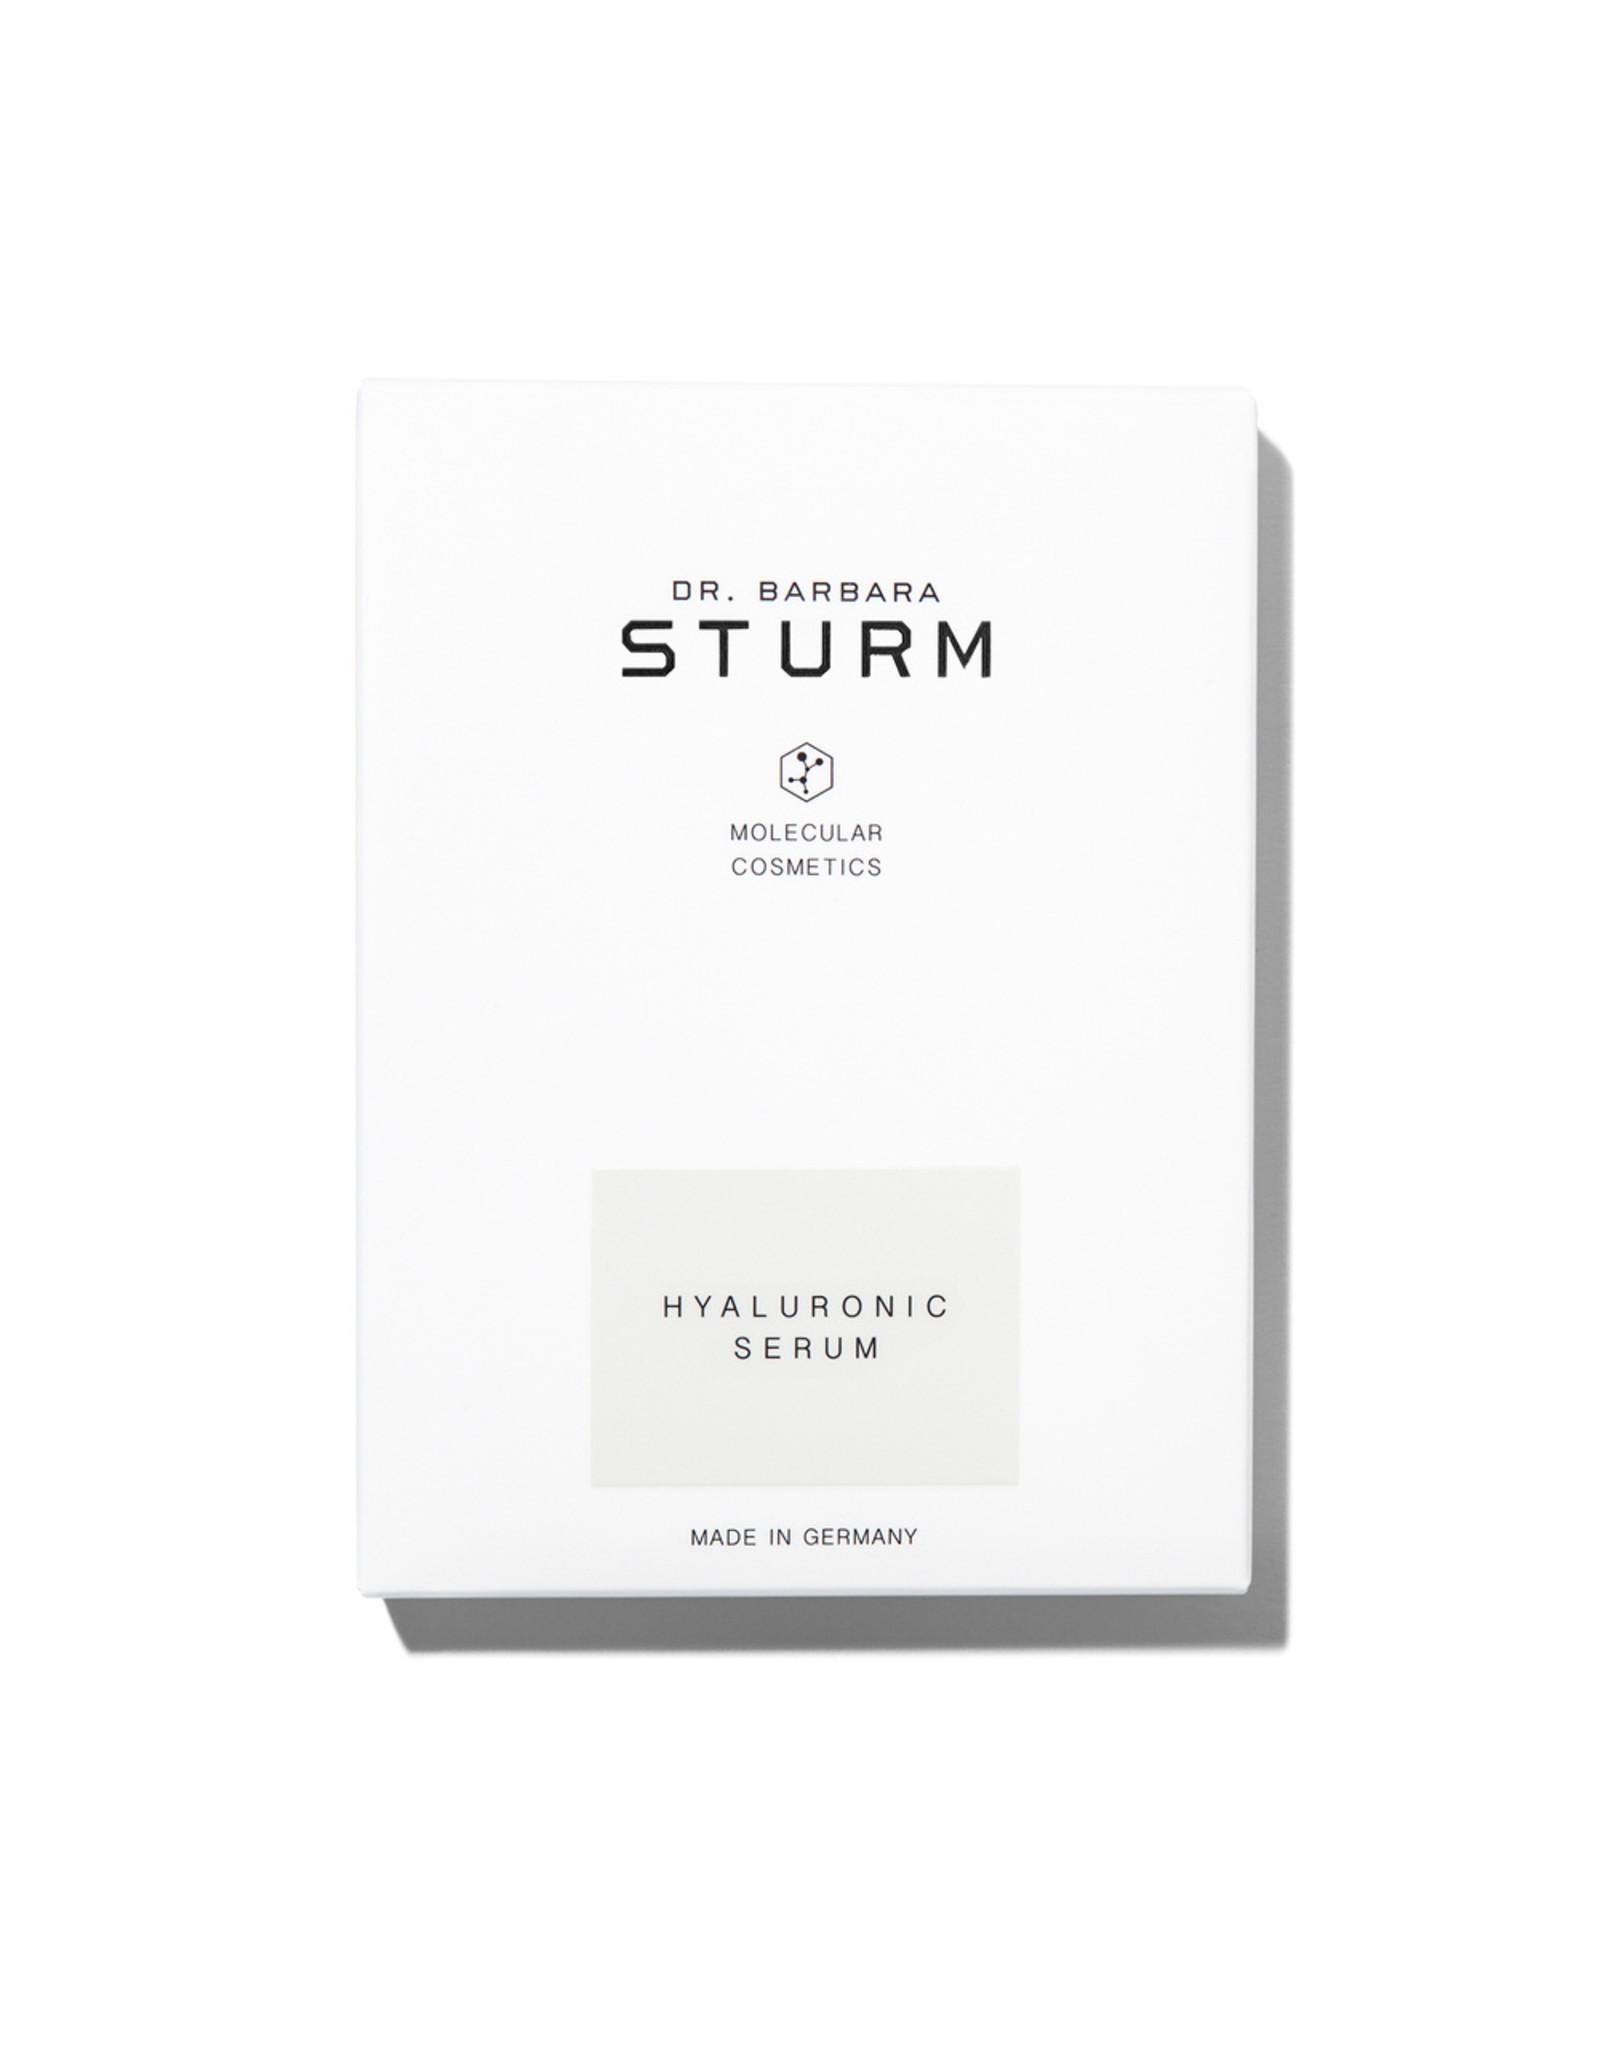 Dr. Barbara Sturm Dr. Barbara Sturm Hyaluronic Serum